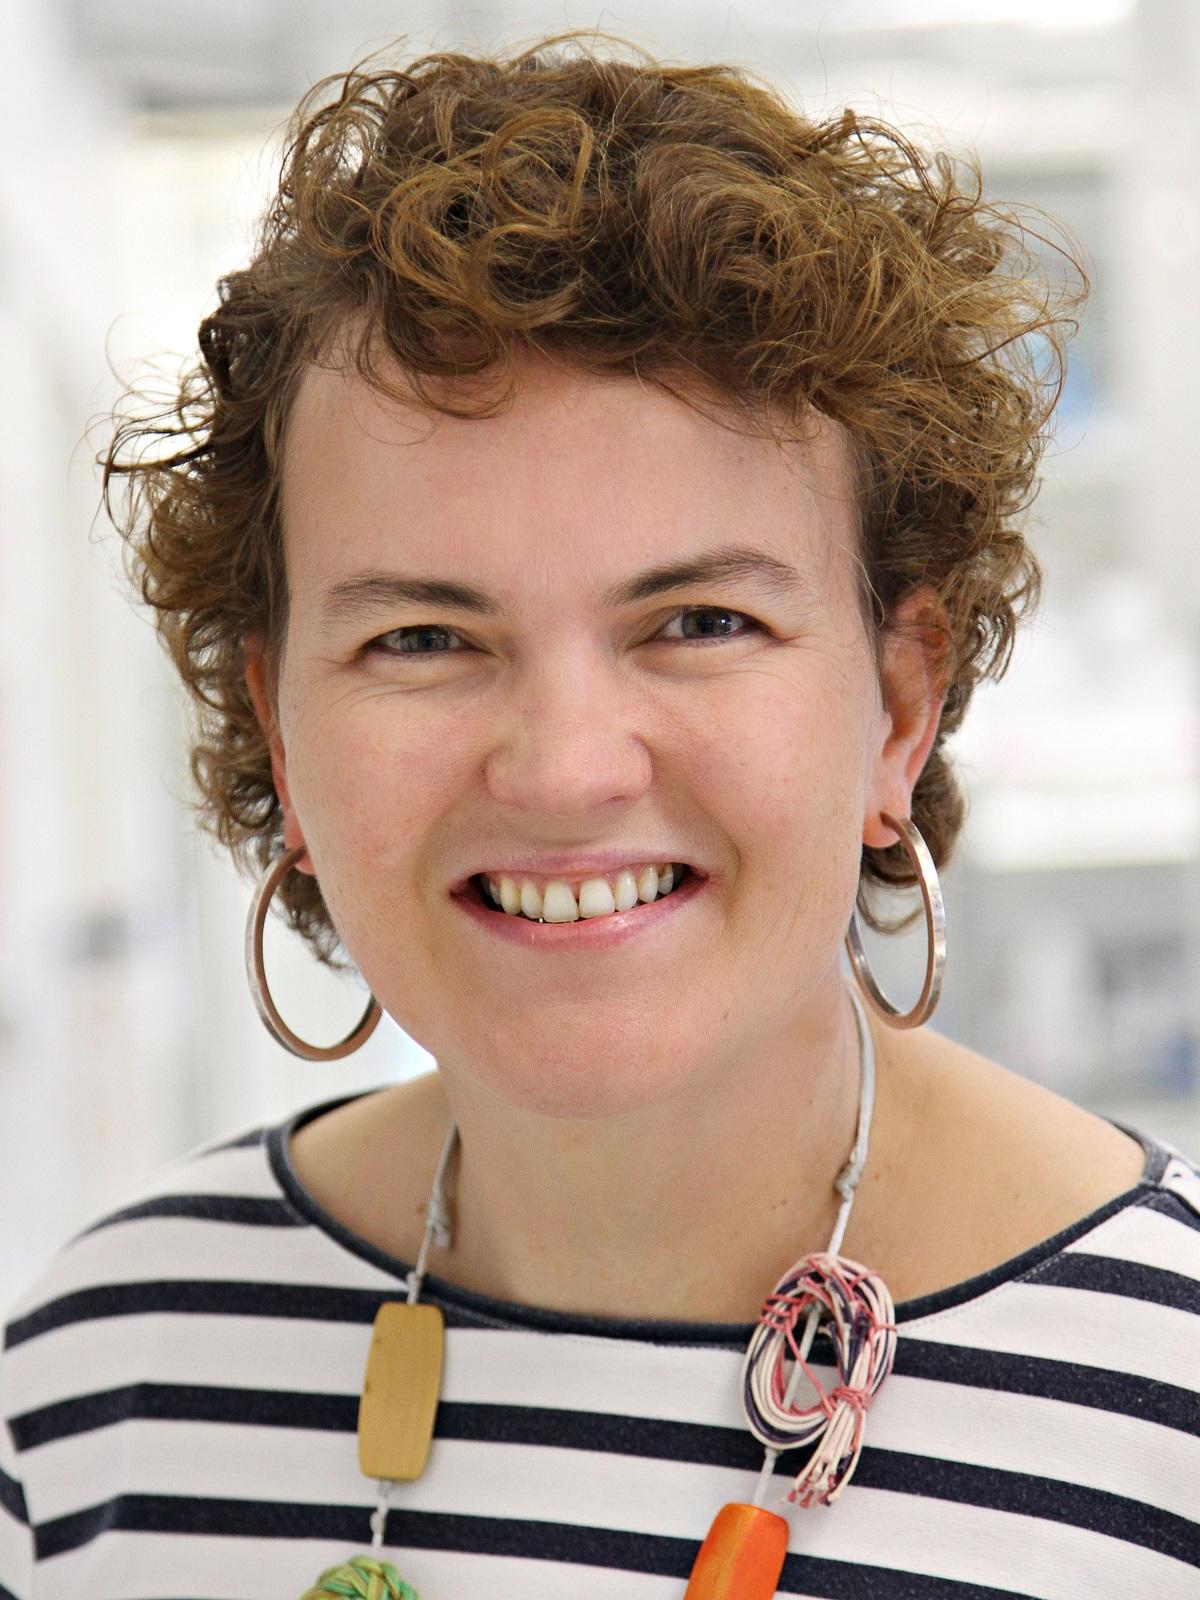 Dr. Marieke Essers